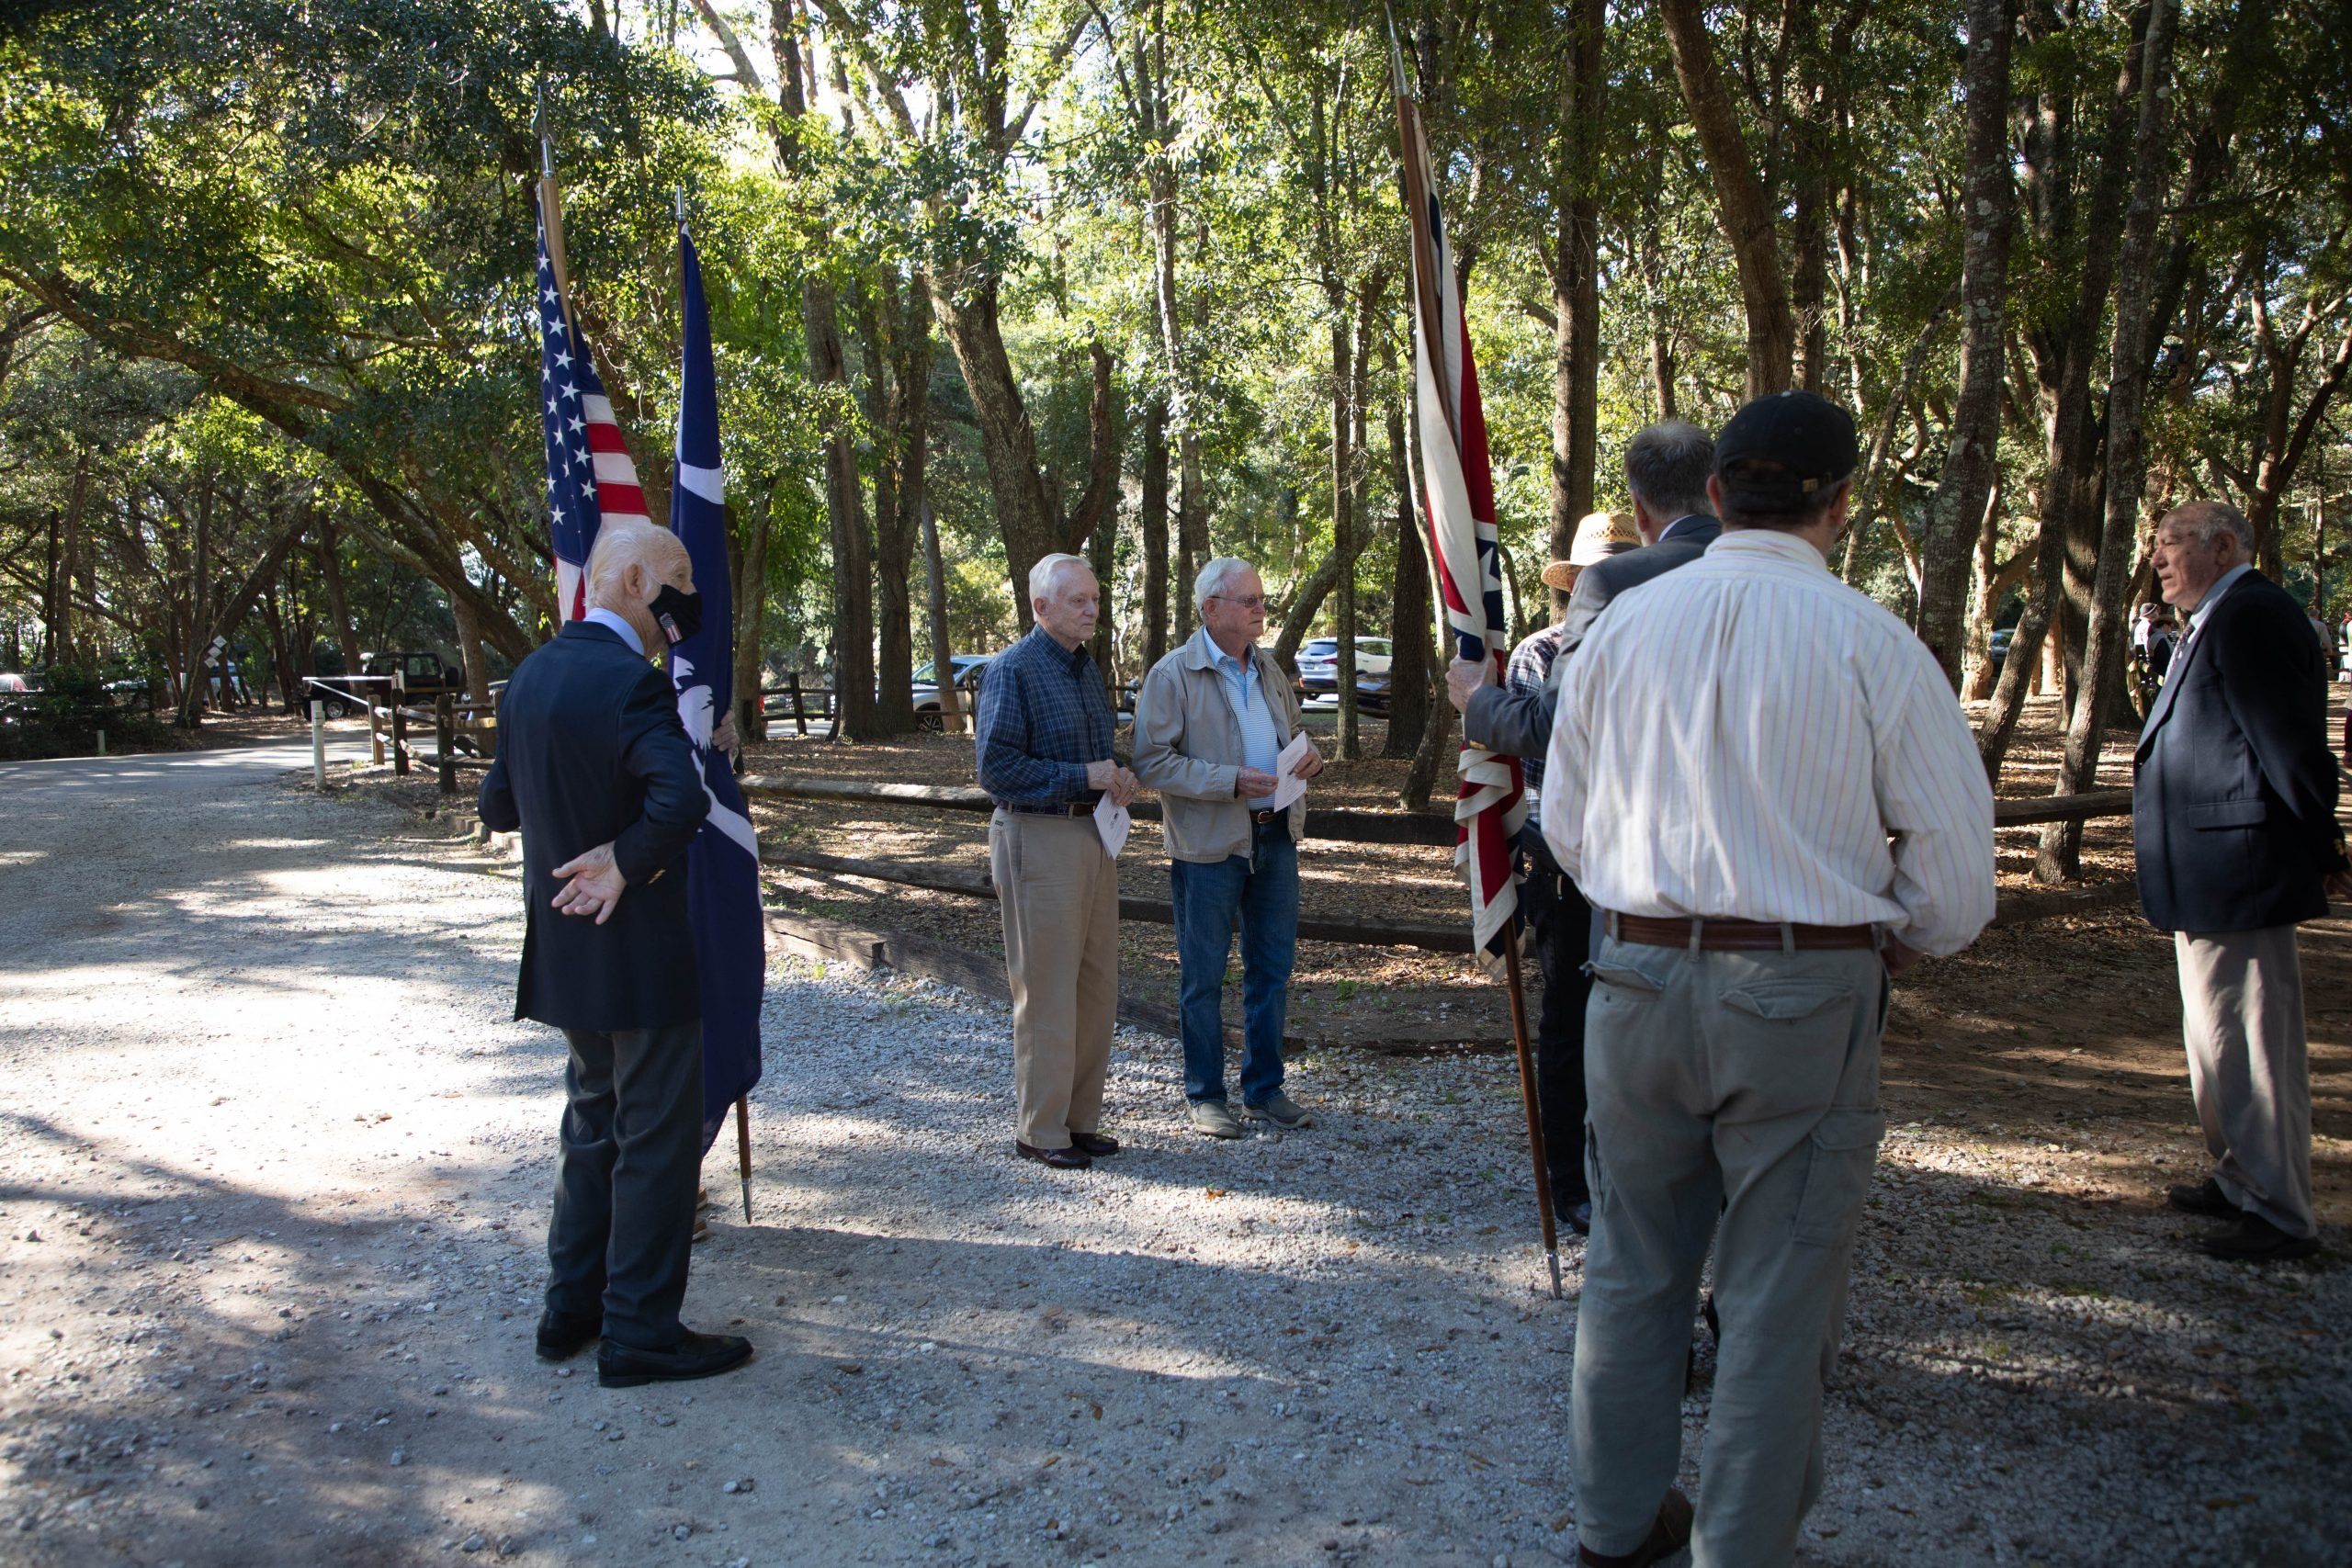 Sons of Confederate Veterans C.S.A. South Carolina 24